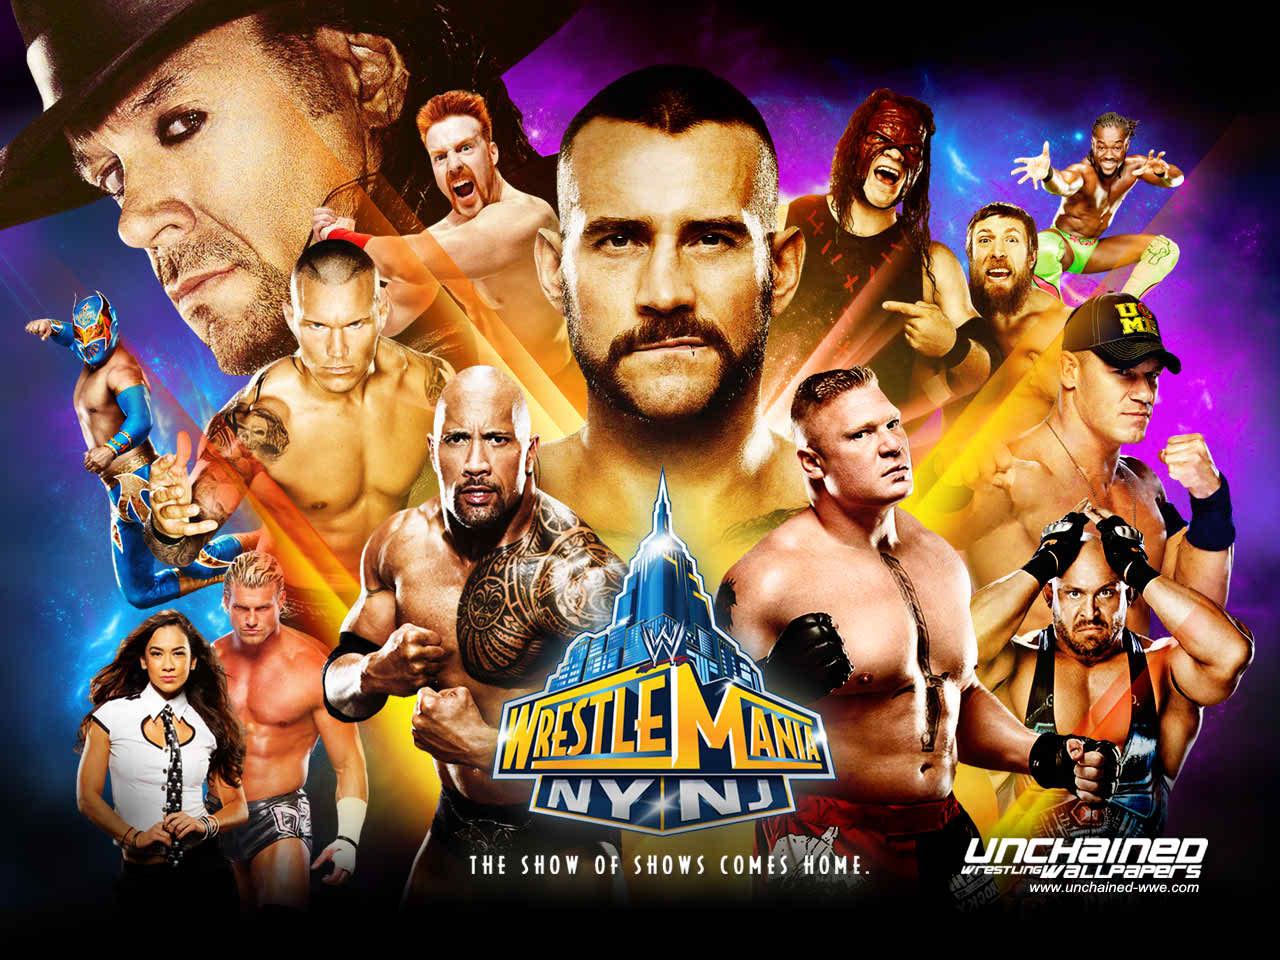 Hd WWE Wallpaper 2113   HDWPro 1280x960